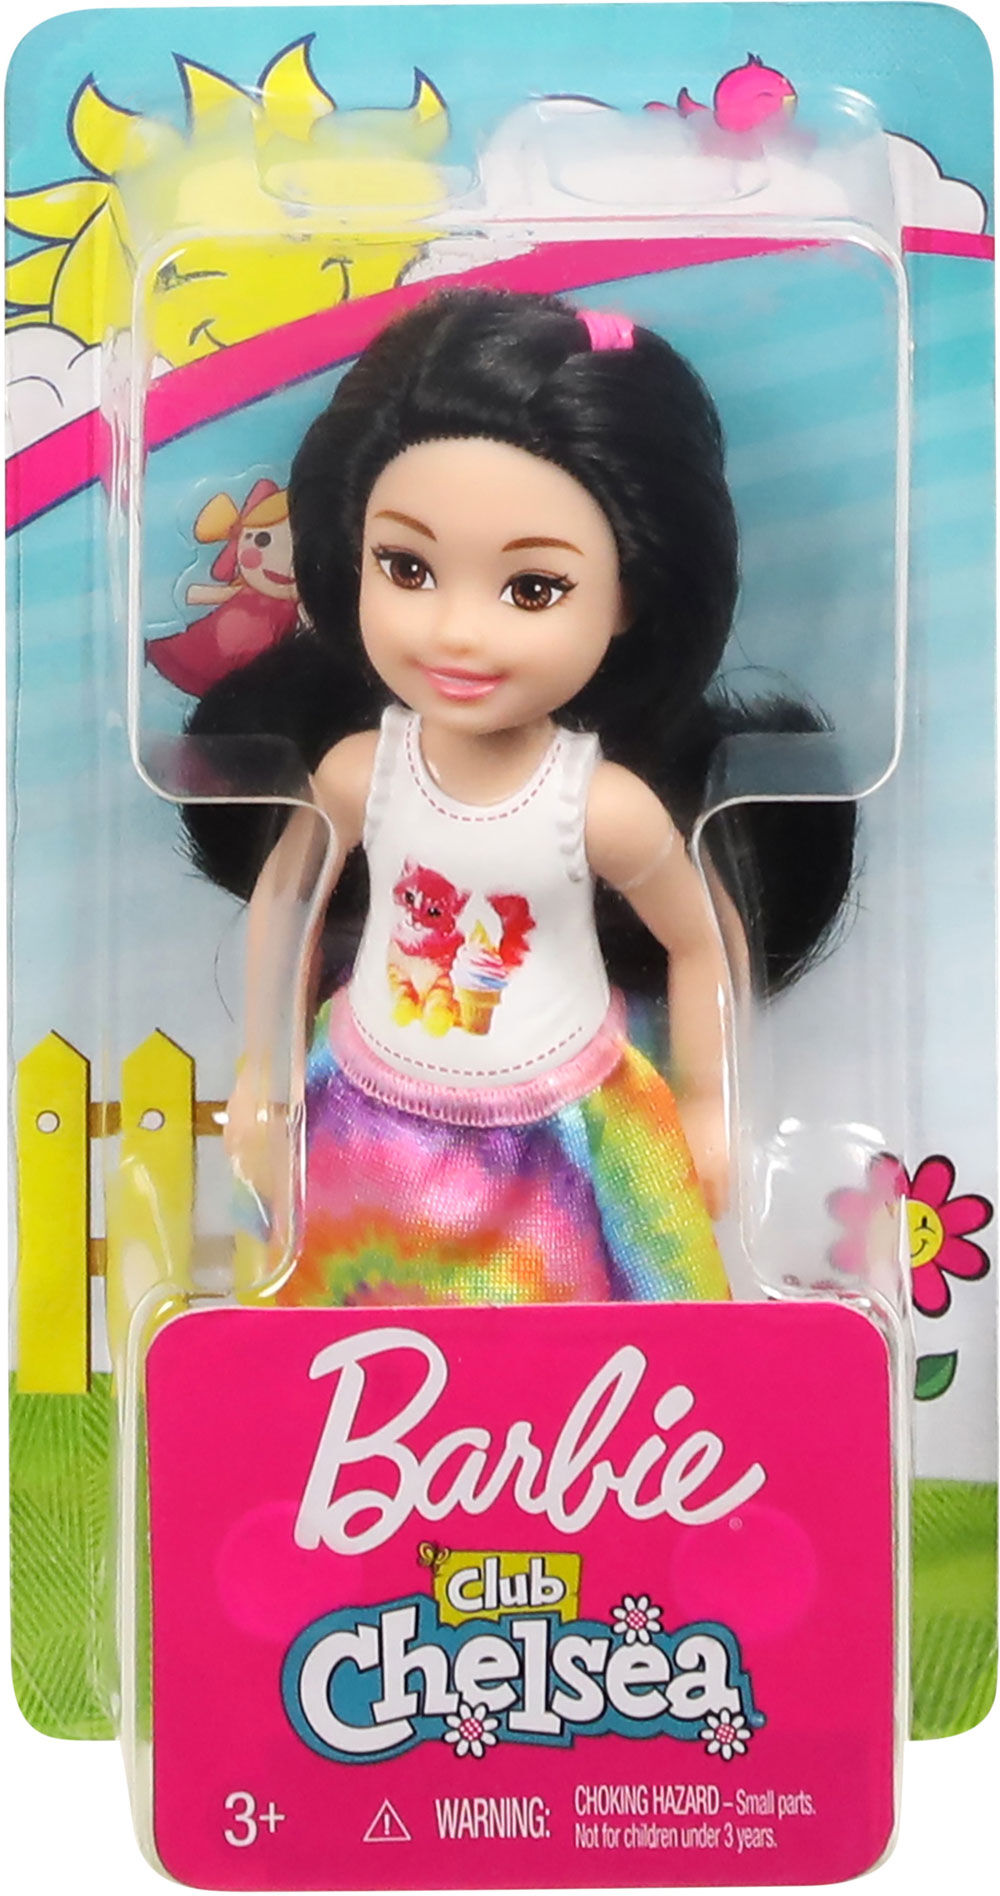 AFRICAN AMERICAN CHESEA CLUB DOLL CUTE RAINBOW DRESS ****Doll ONLY****